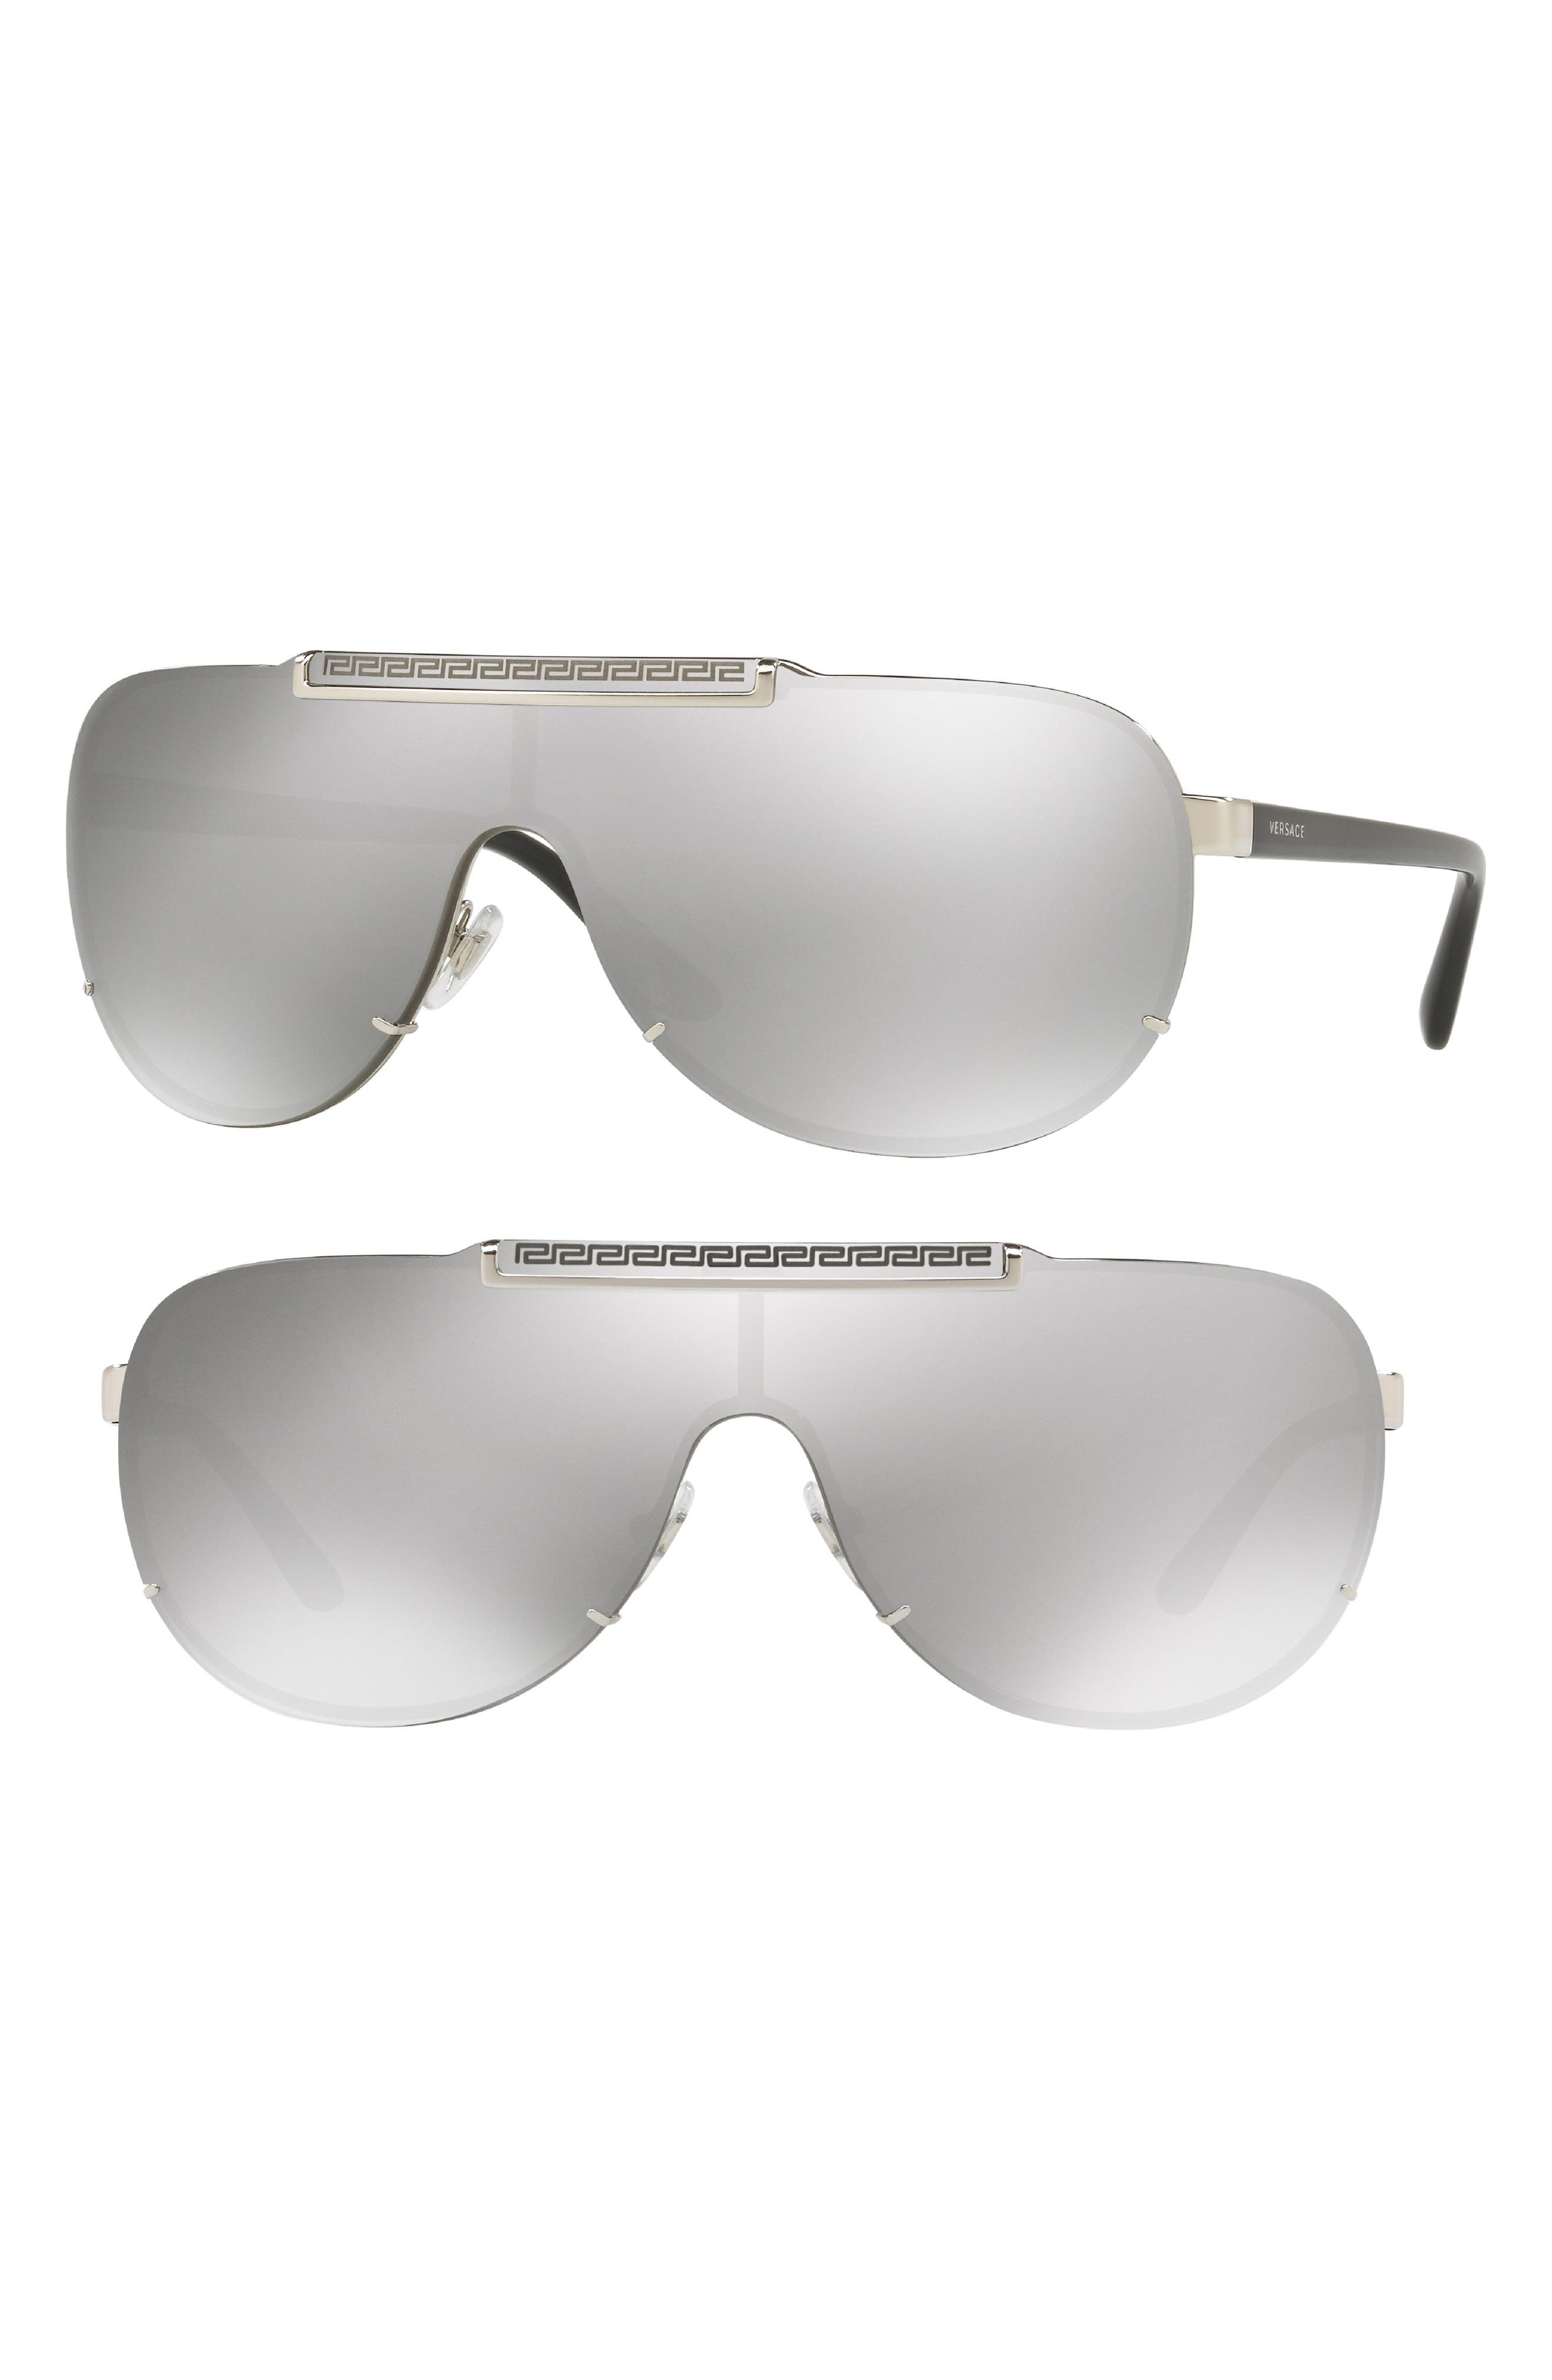 40mm Shield Sunglasses,                             Main thumbnail 1, color,                             Silver